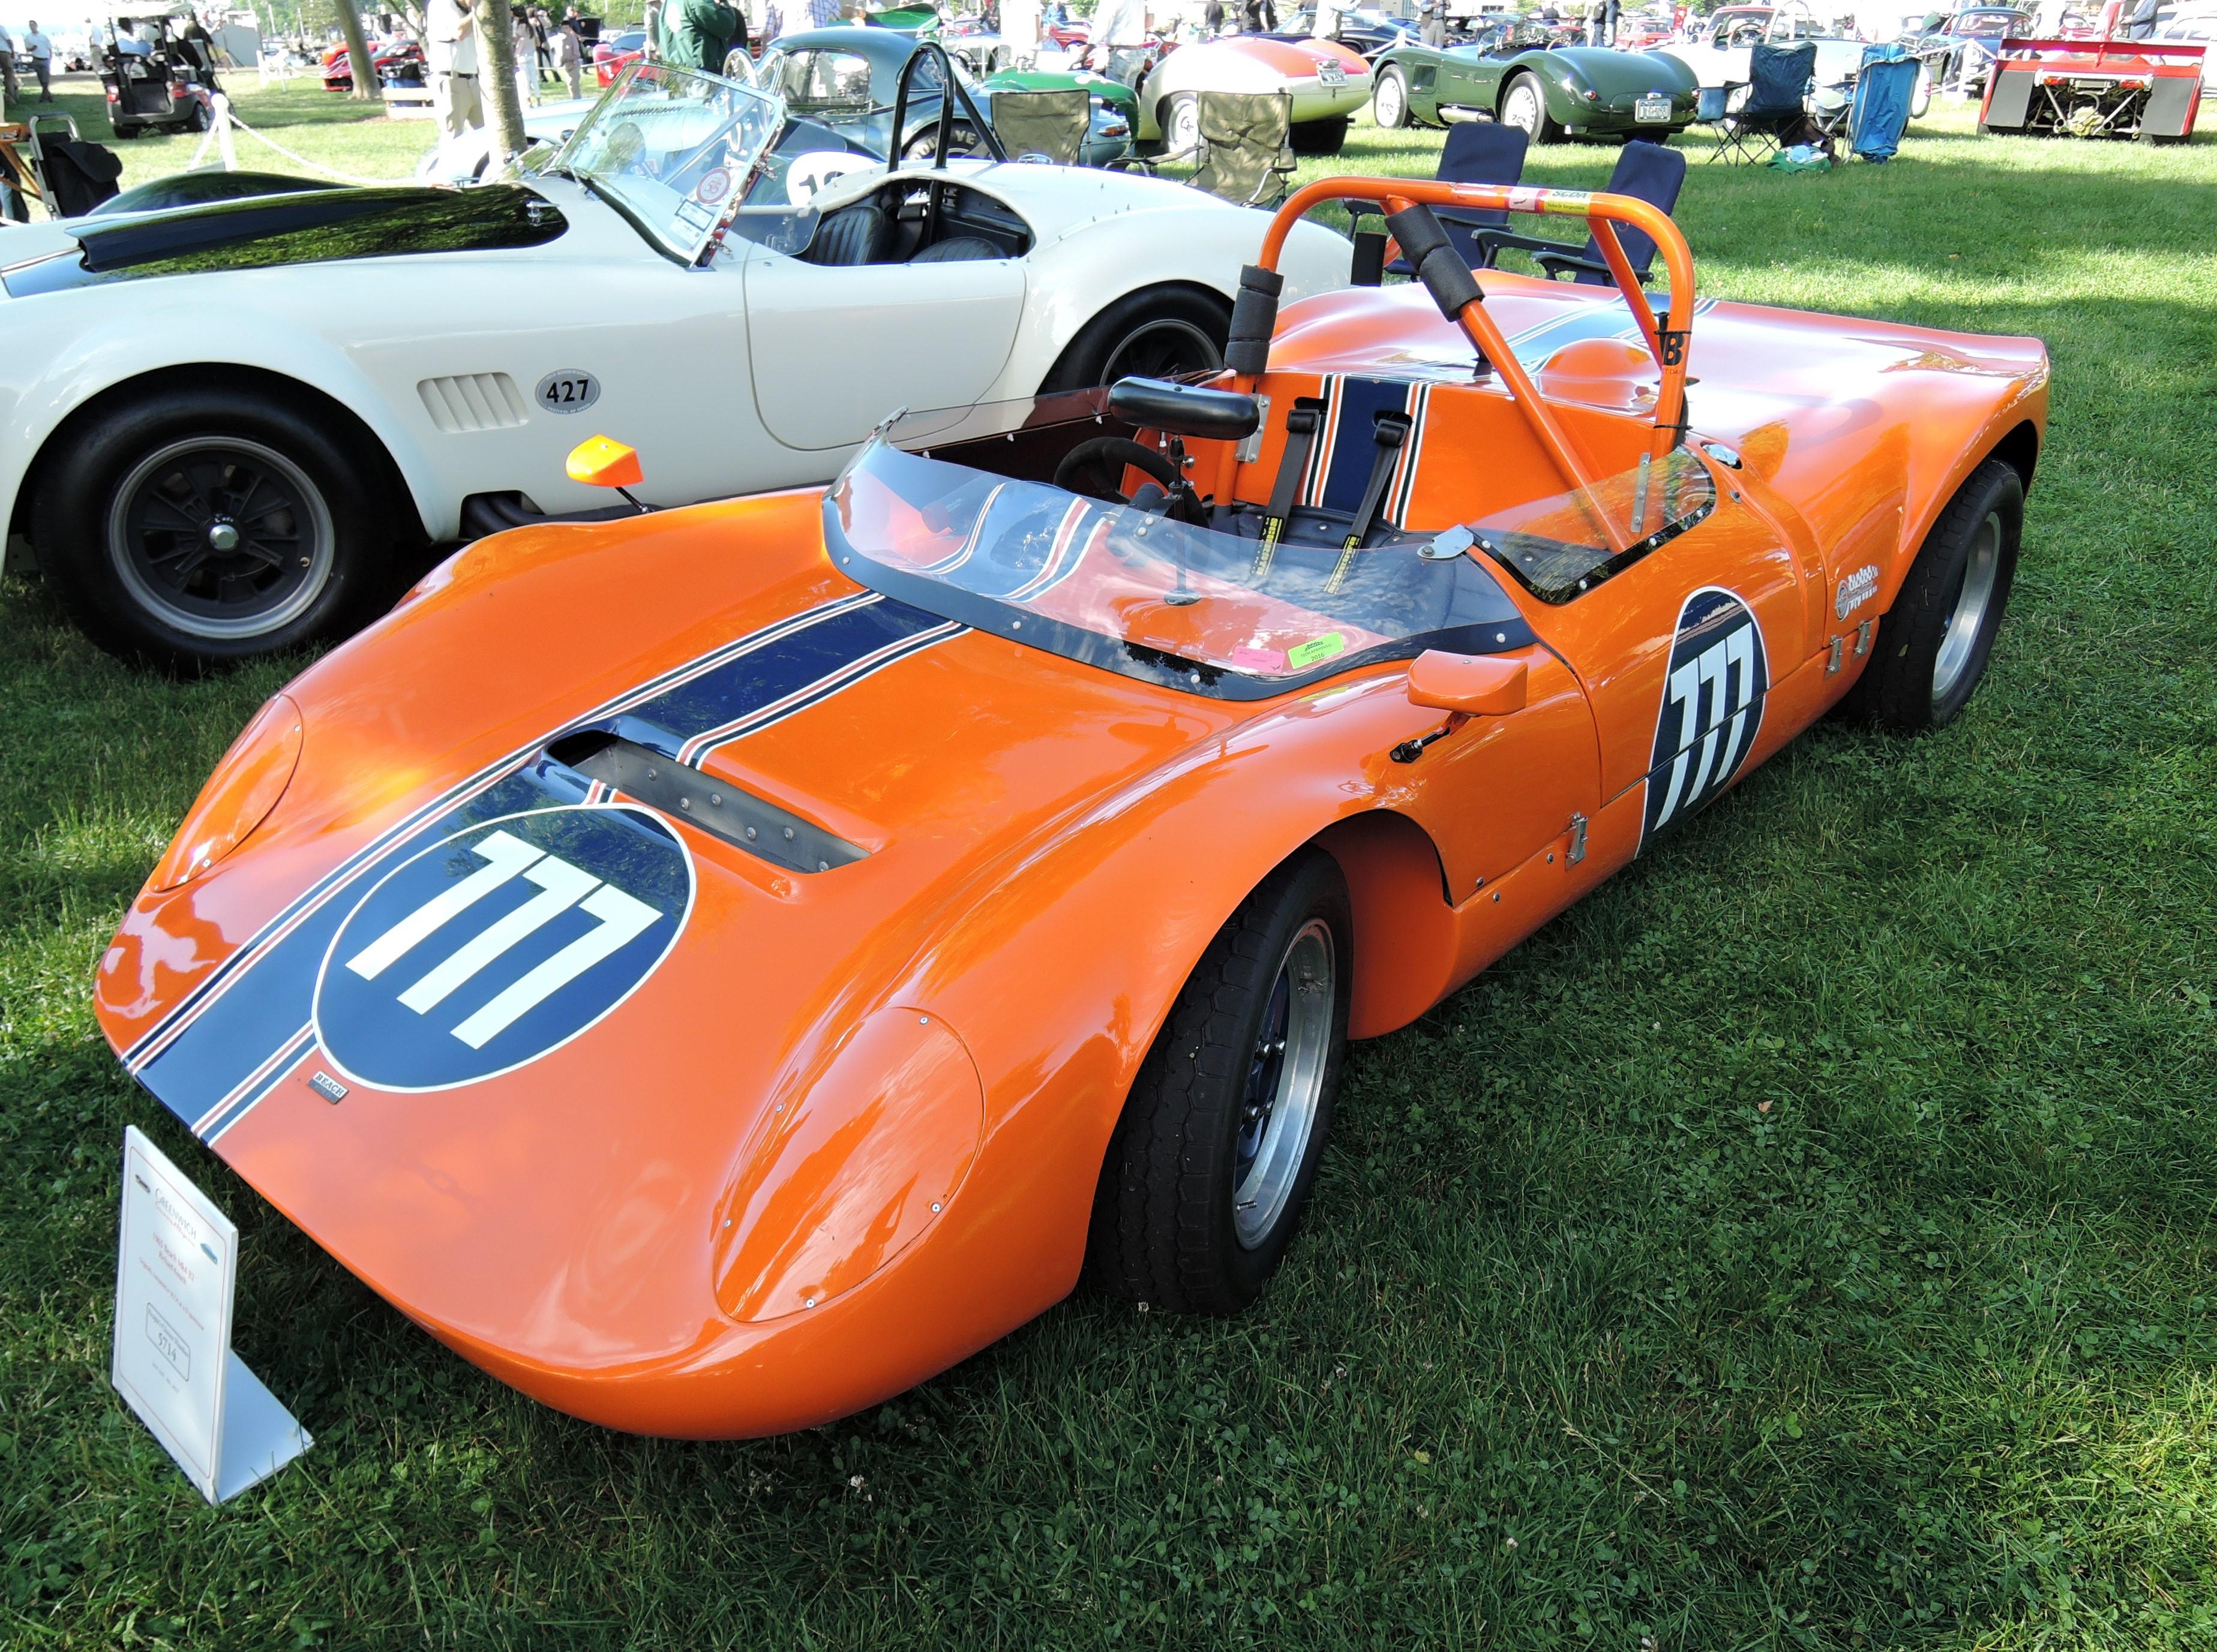 orange 1965 Beach Mk4 B2 - Greenwich Concours d'Elegance 2017